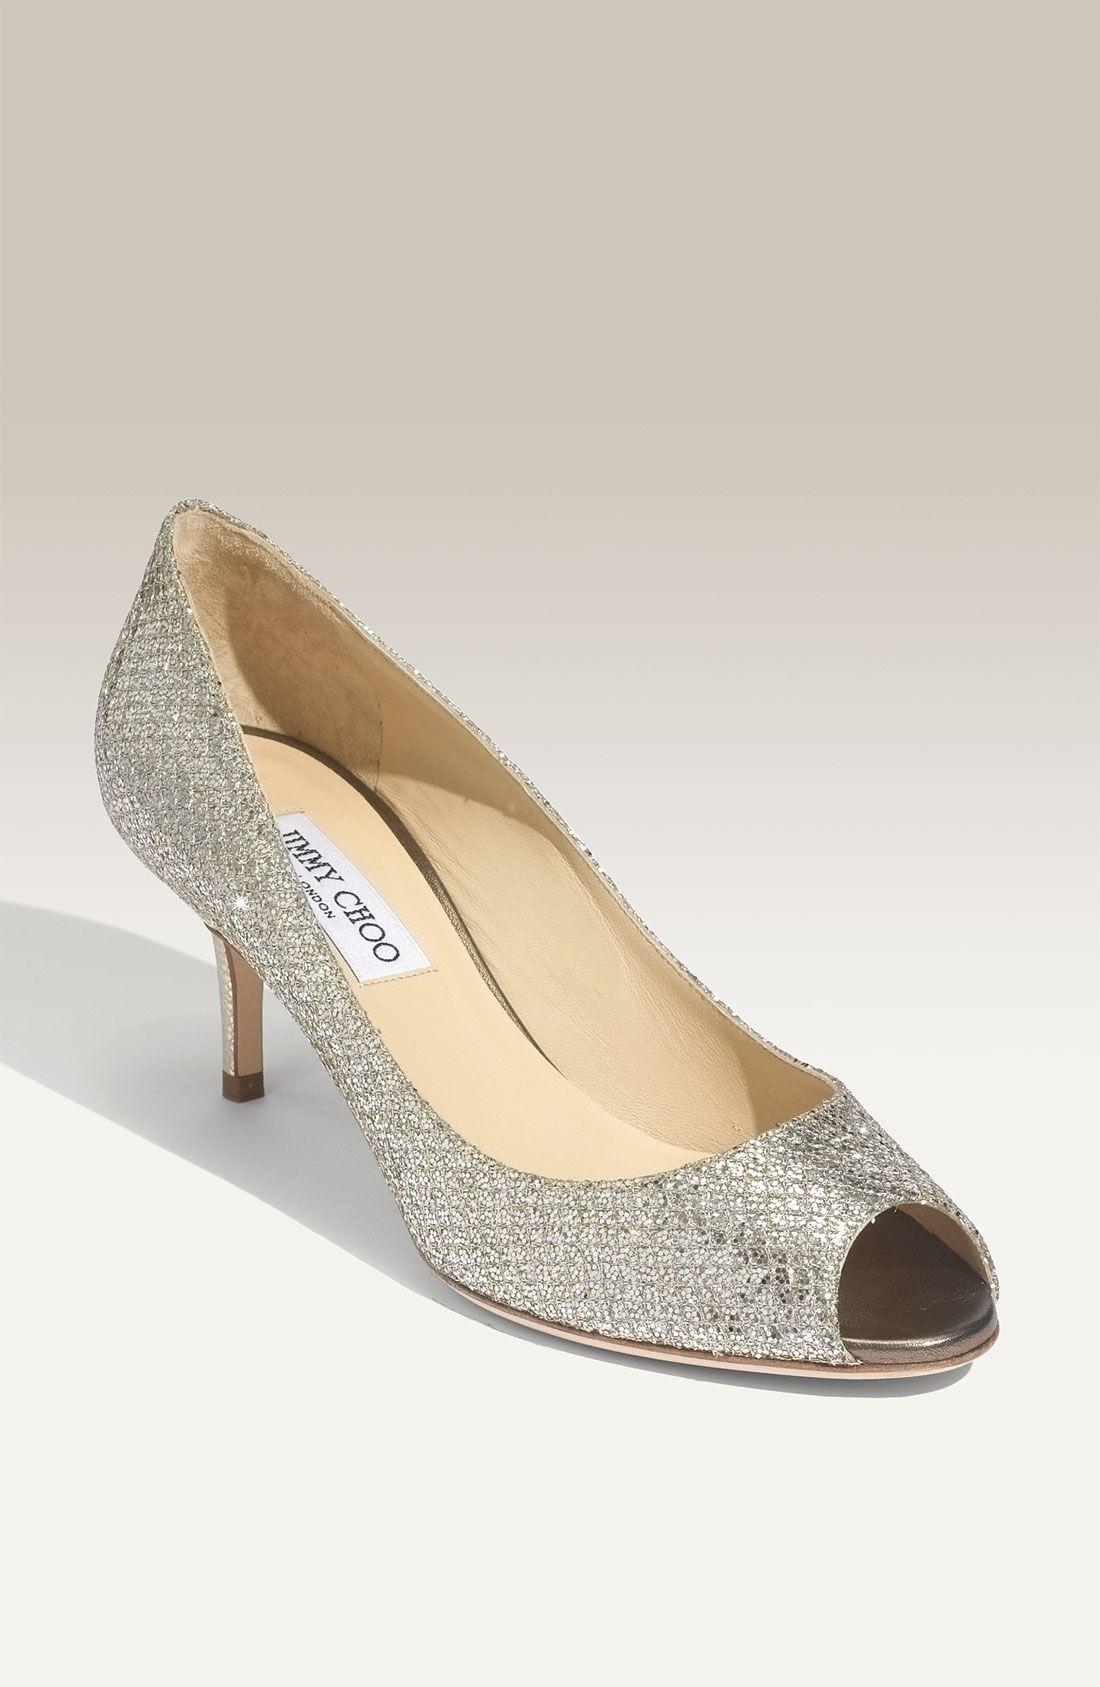 Jimmy Choo Isabel Pump Nordstrom Jimmy Choo Isabel Jimmy Choo Wedding Shoes Jimmy Choo Heels